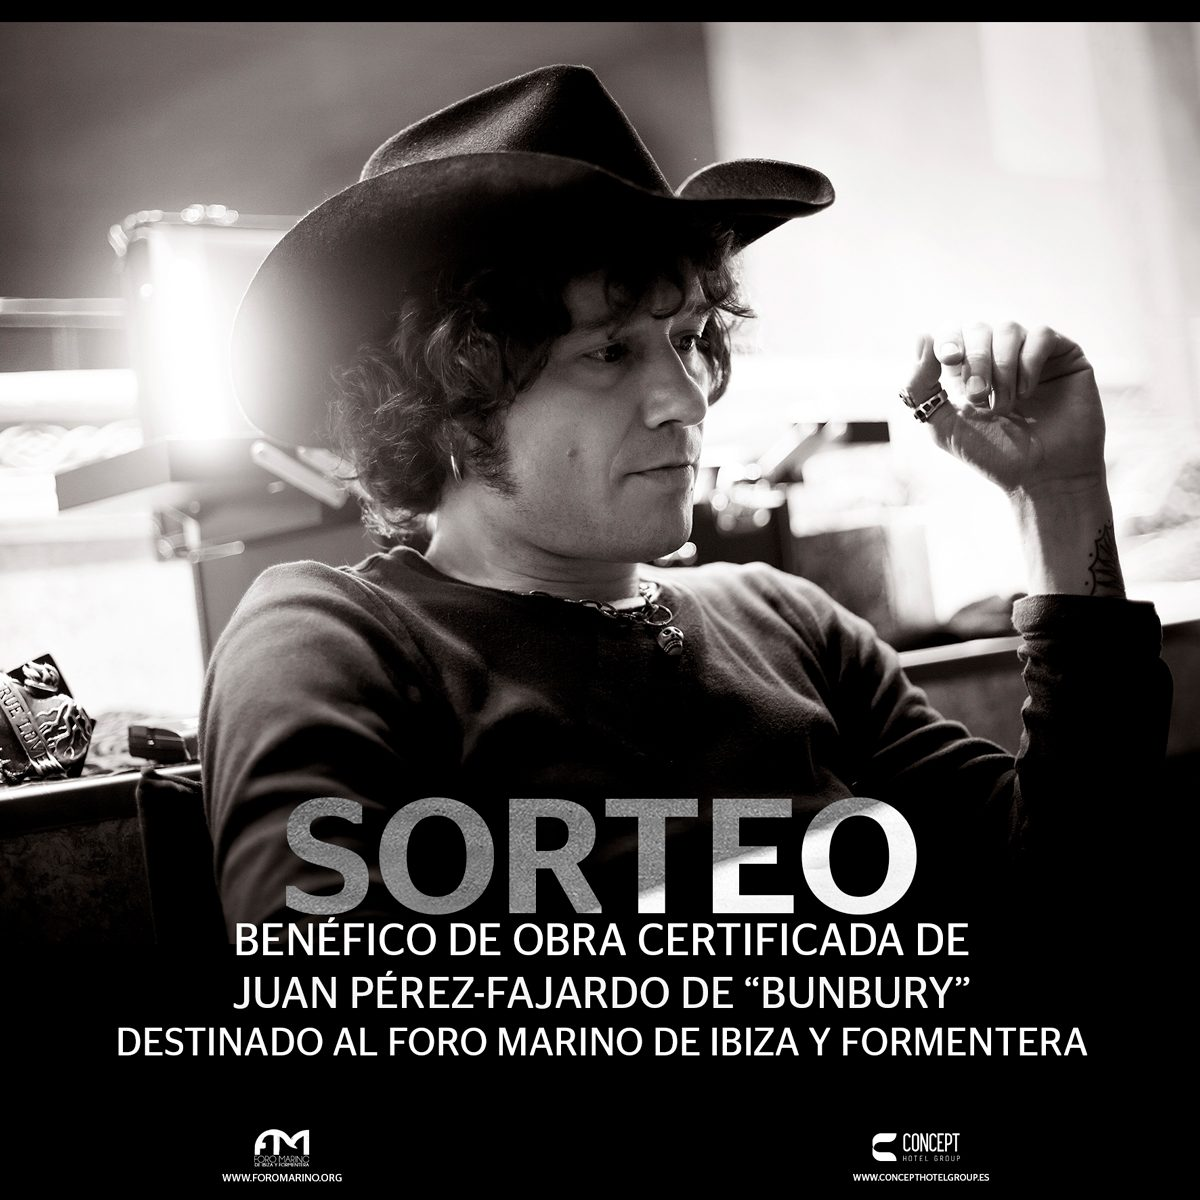 Draw-Bunbury-Juan-Perez-Fajardo-Forum-Marino-Ibiza-Konzept-Hotel-Gruppe-Ibiza-2020-Welcometoibiza